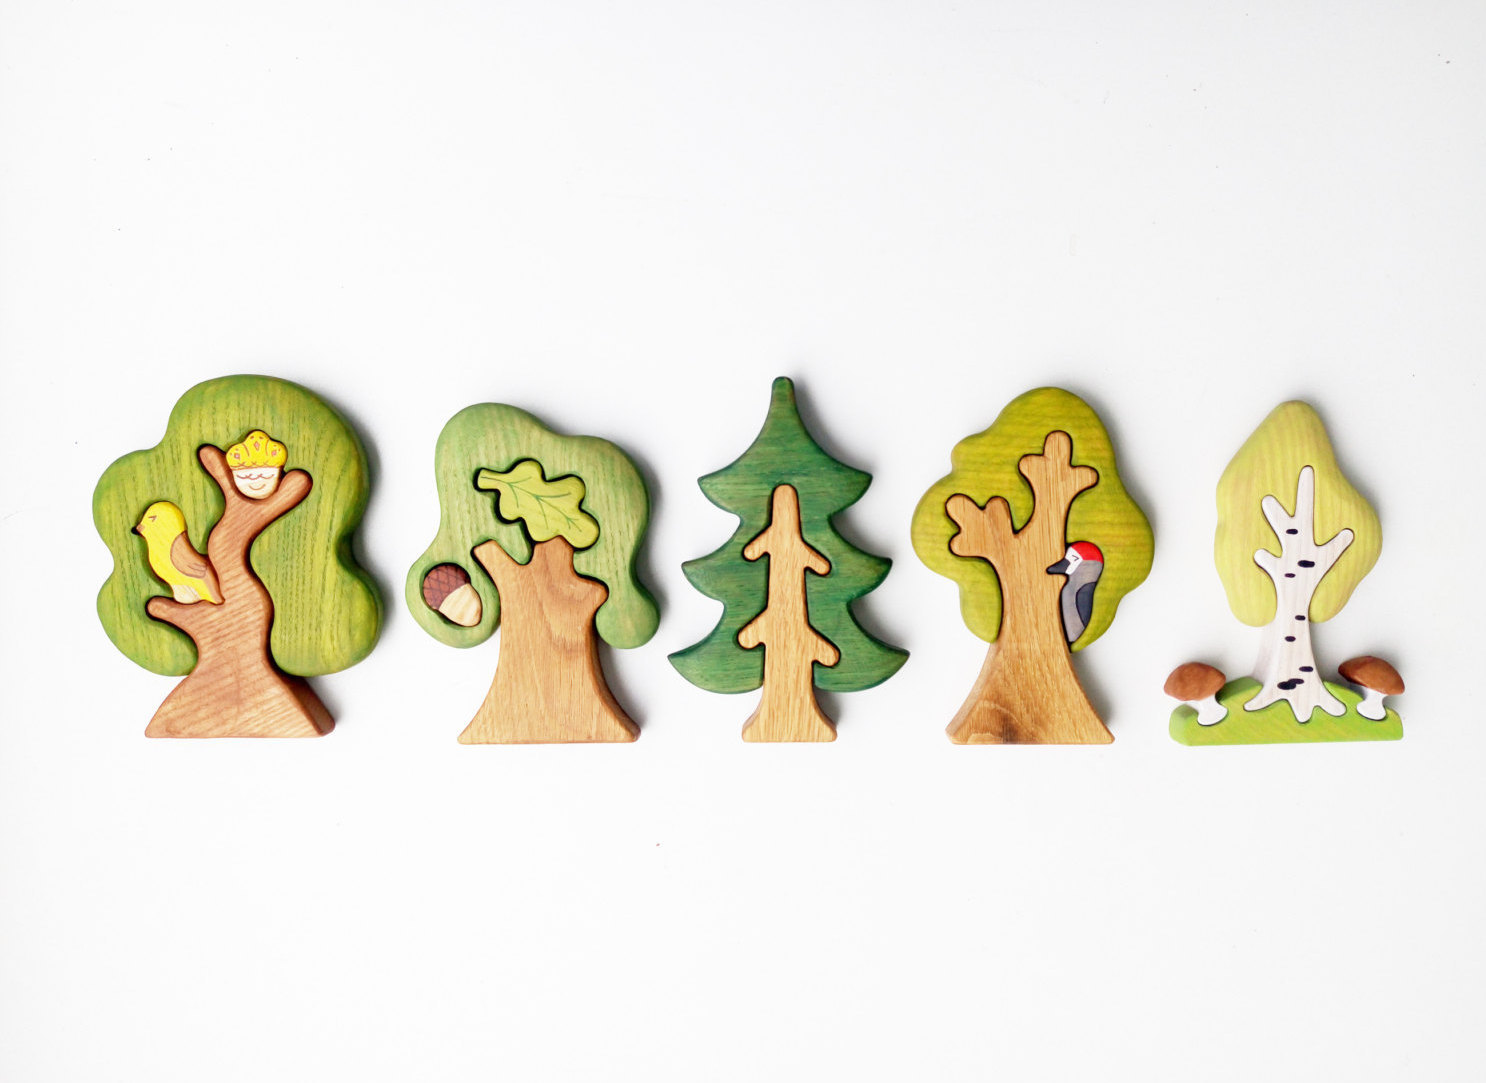 Waldorf tree fir tree.  Waldorf nature table. Pincone tree toy. X-mas tree